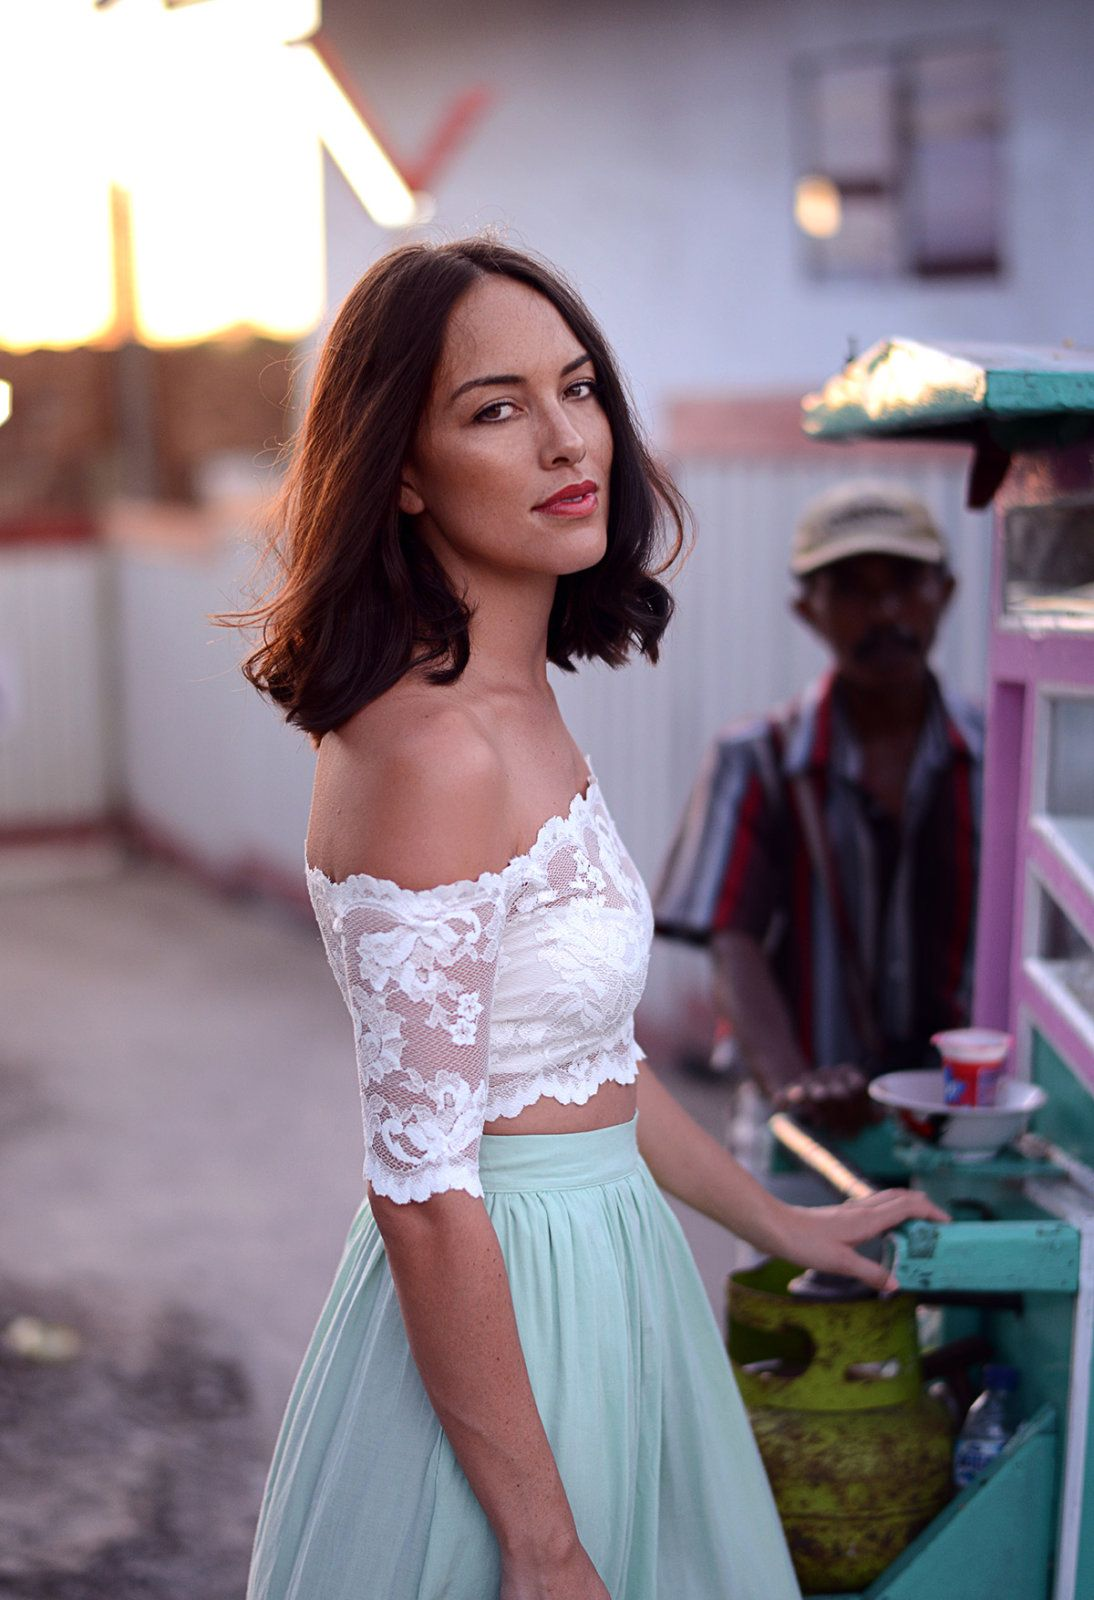 aae376b14bd Everyday Crop Ivory | Alles wat mooi is | Bridesmaid outfit, White ...